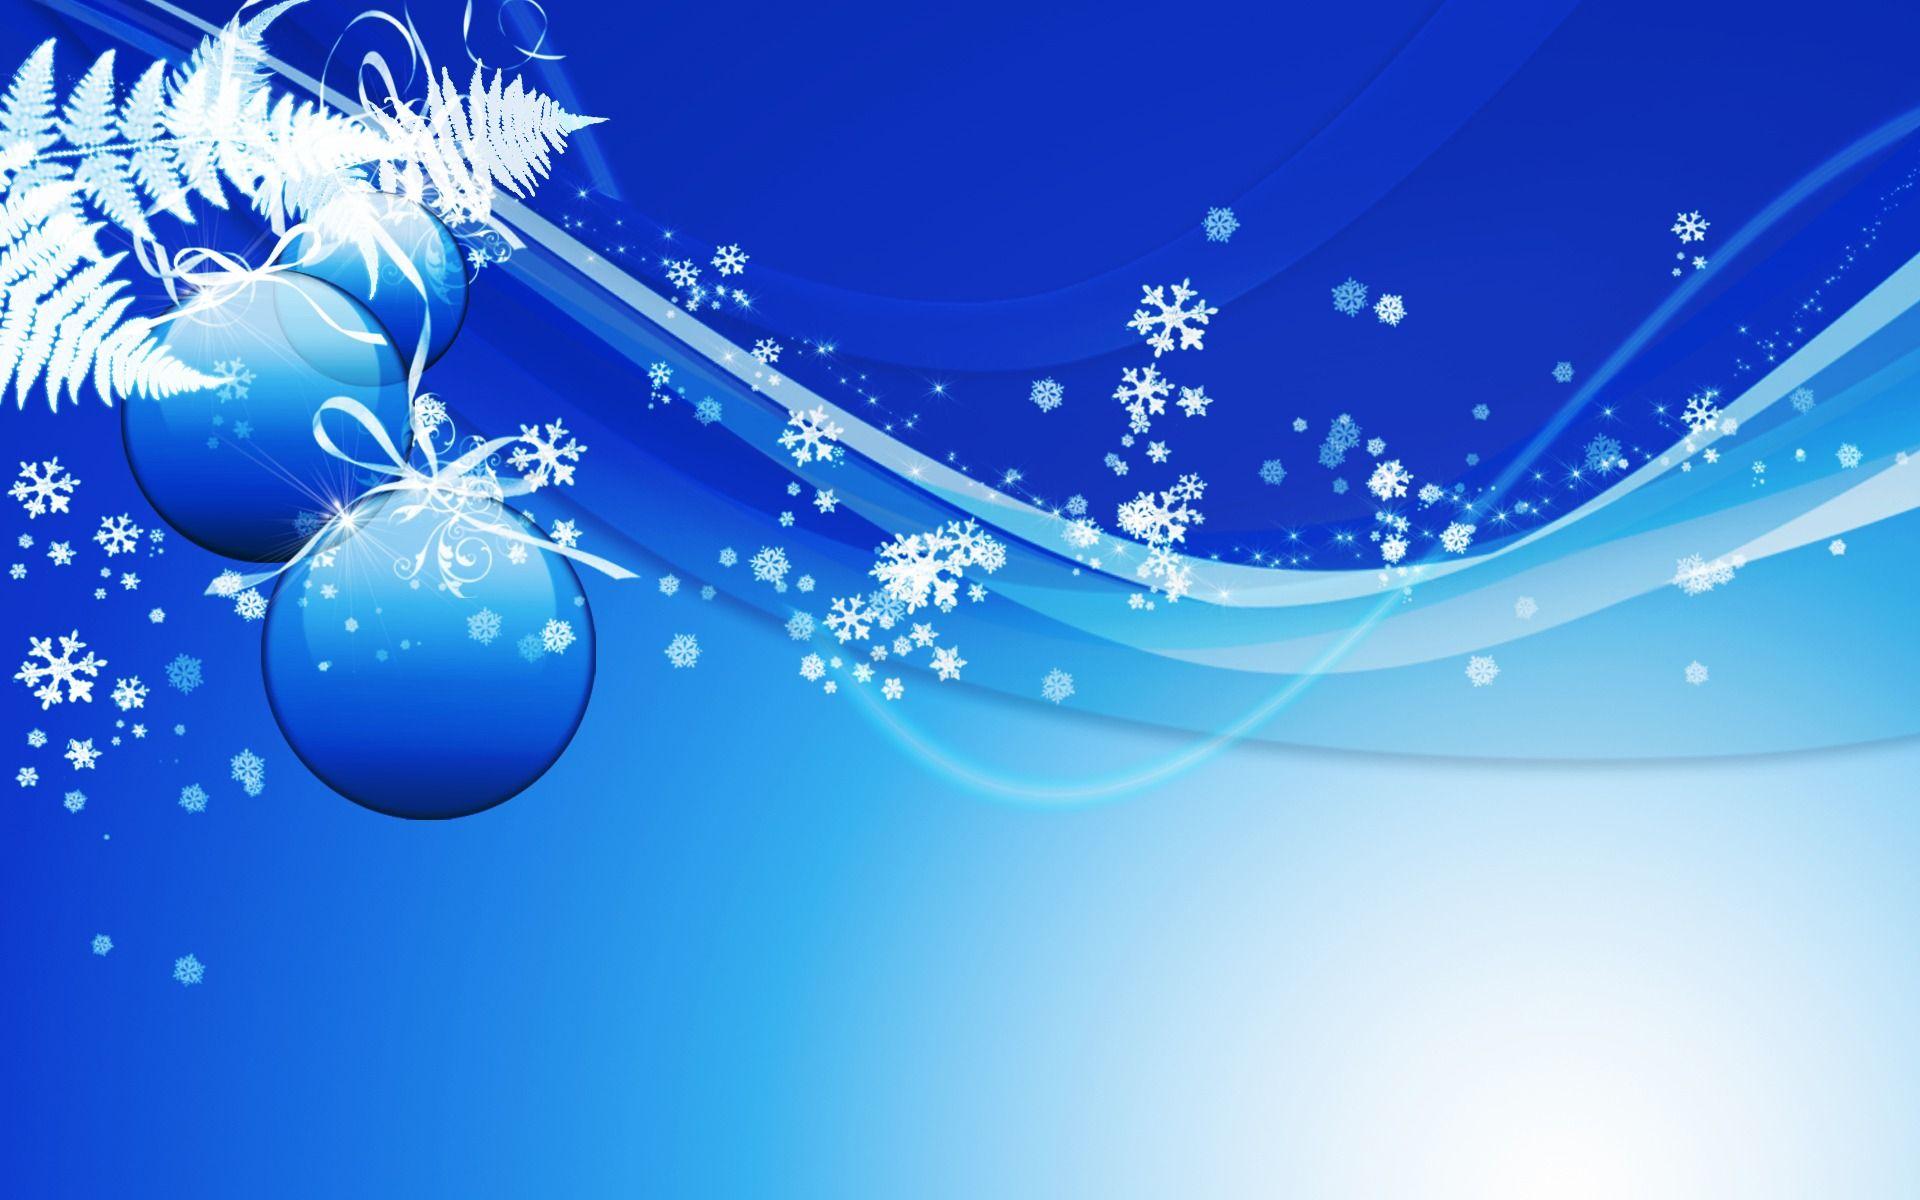 Christmas Ornament - Blue Wallpaper - Christian Wallpapers